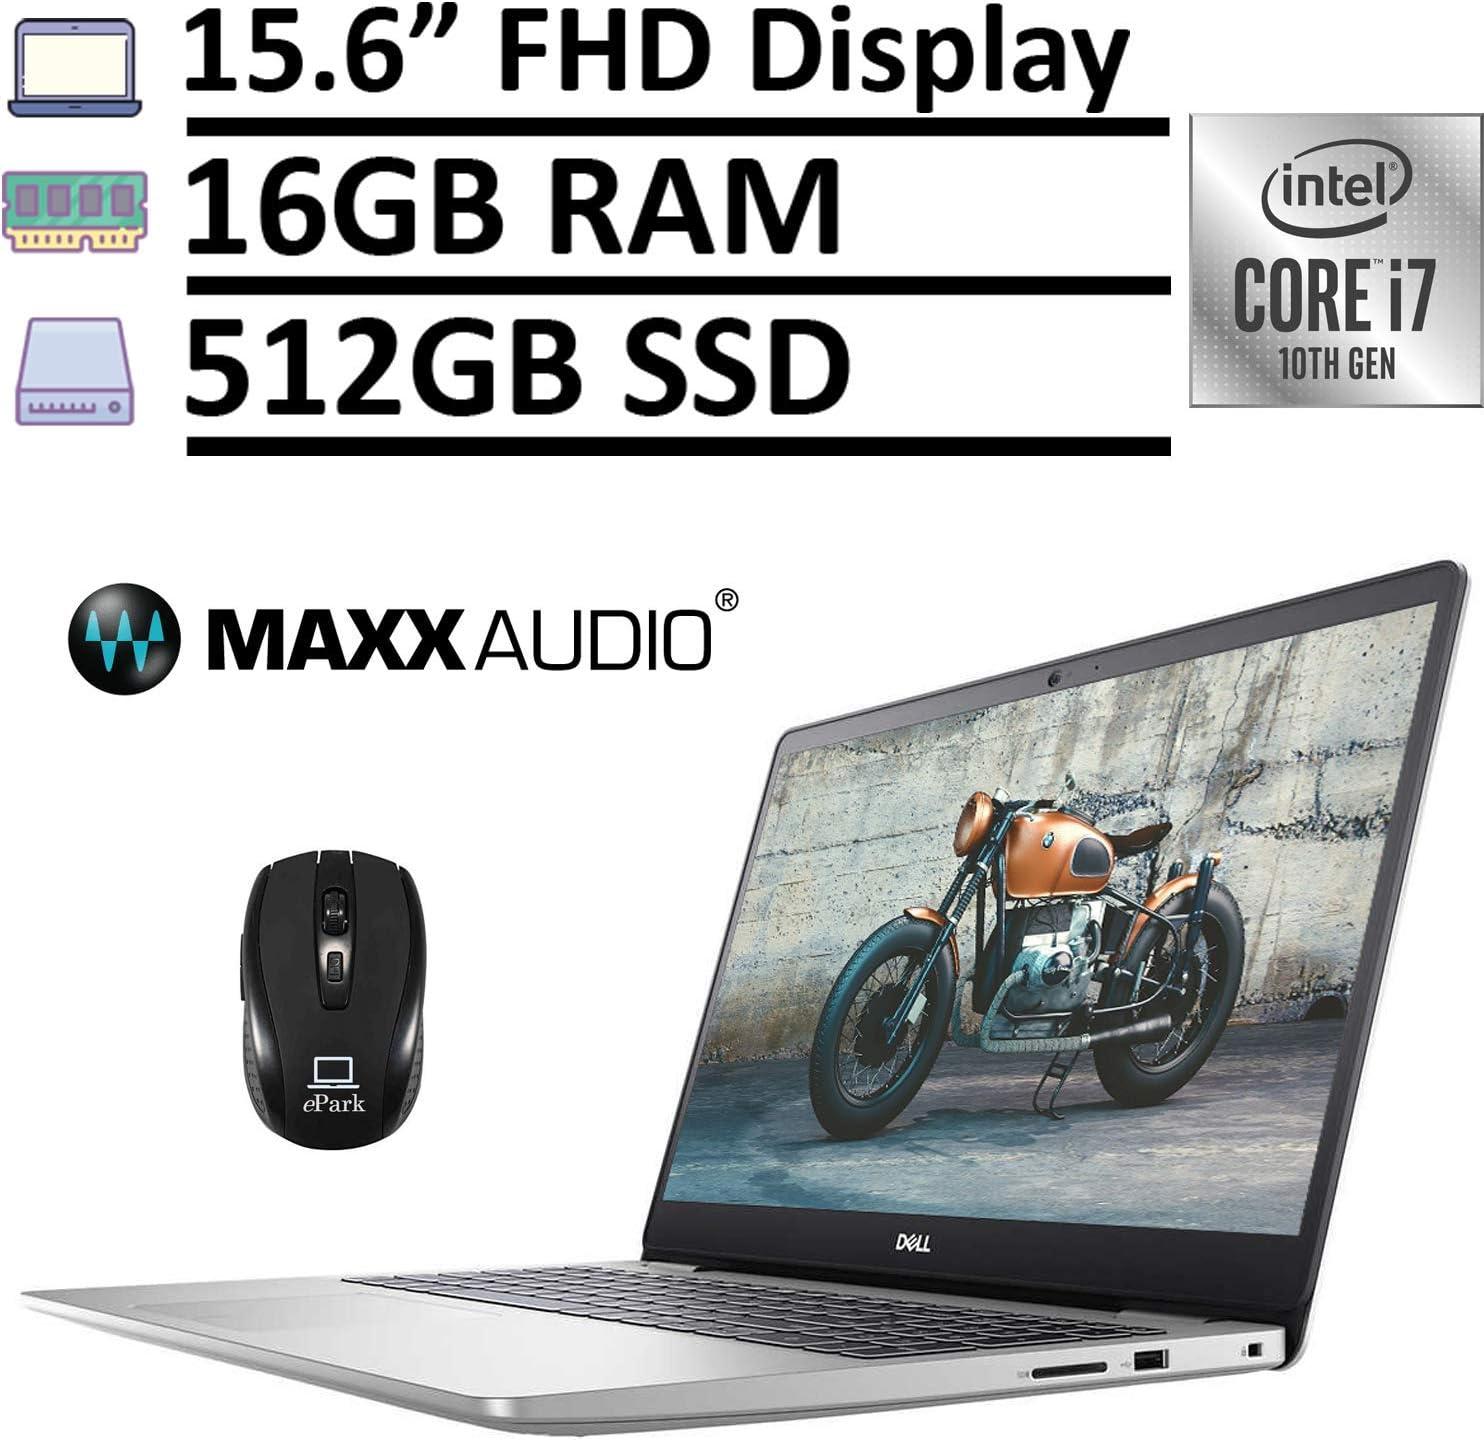 "Latest 2020 Dell Inspiron 15 5000 5593 Laptop, 15.6"" FHD 1080p Display, 10th Gen Intel Core i7-1065G7 16GB RAM 512GB SSD, MaxxAudio Pro Backlit KB Fingerprint Win 10 + ePark Wireless Mouse"